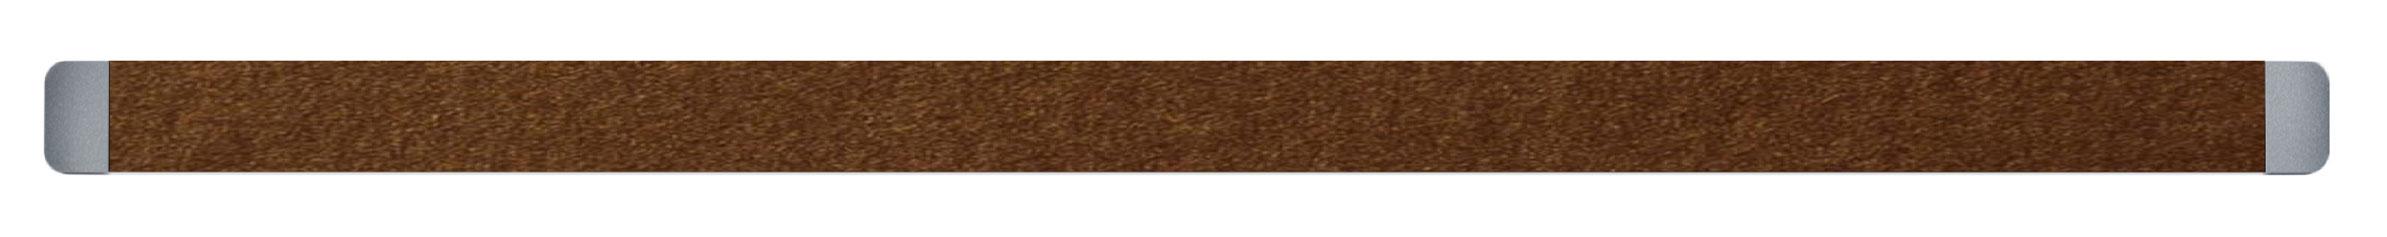 Stylecover Bronze Effektlack (Metall)